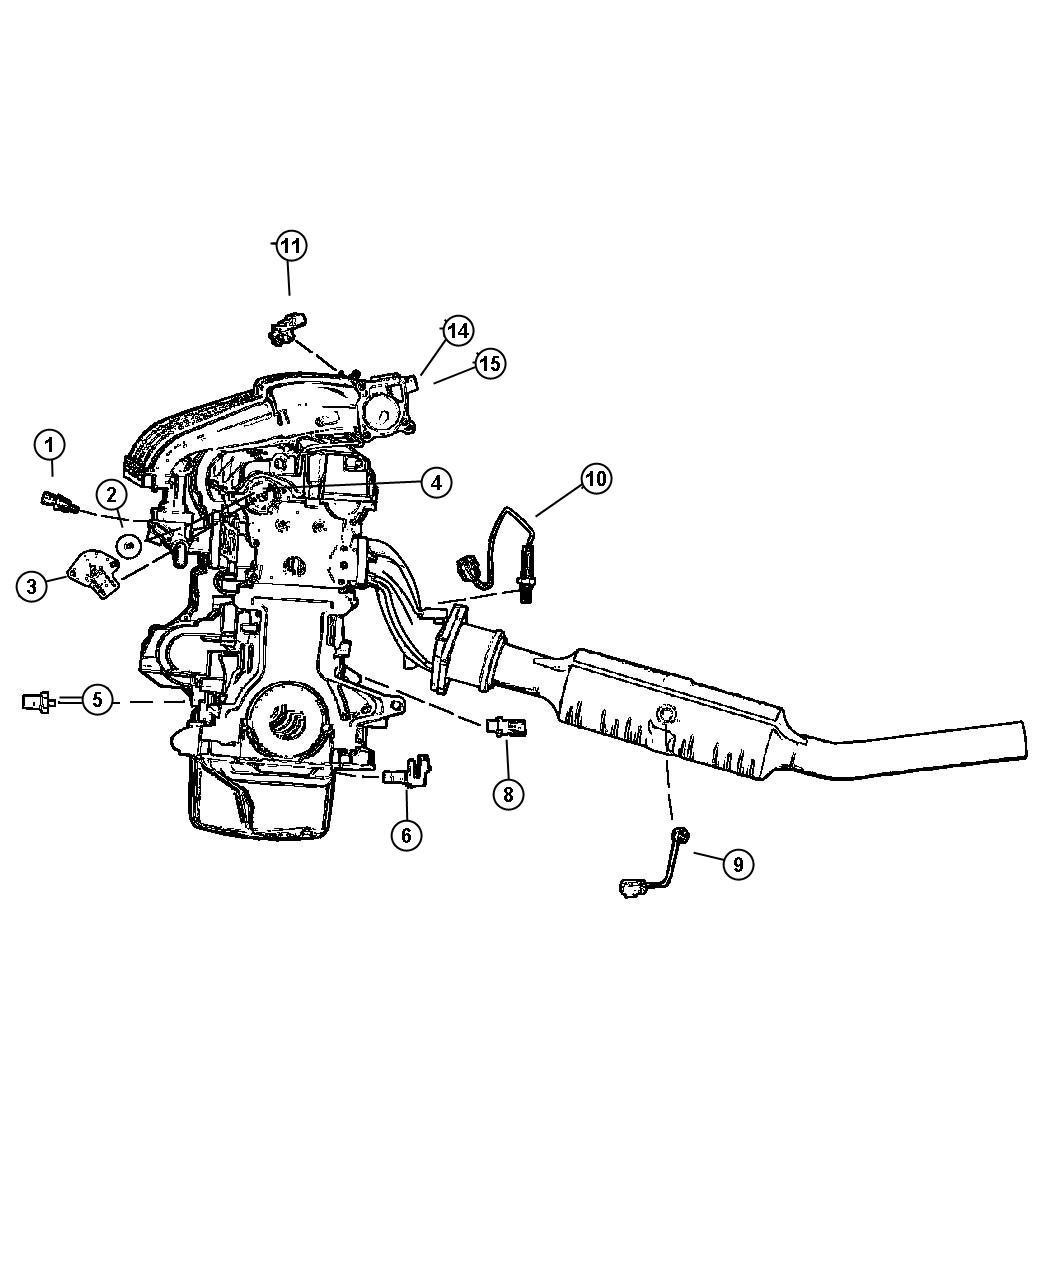 Chrysler Pt Cruiser Sensor Throttle Position After